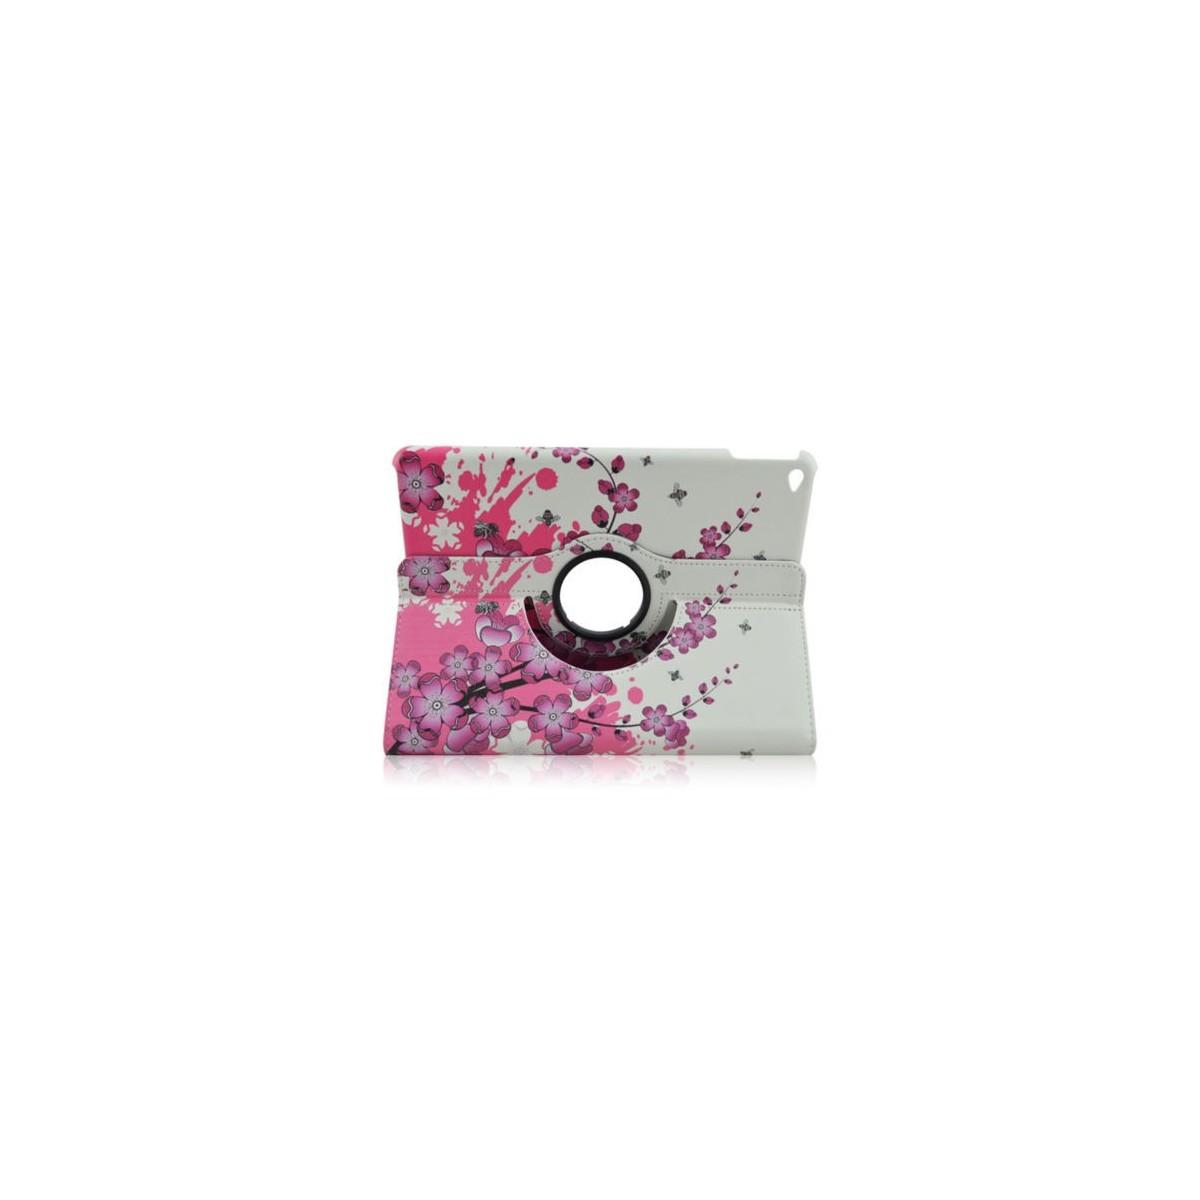 Crazy Kase - Etui iPad Air 2 Rotatif 360° motif Fleurs Japonaises